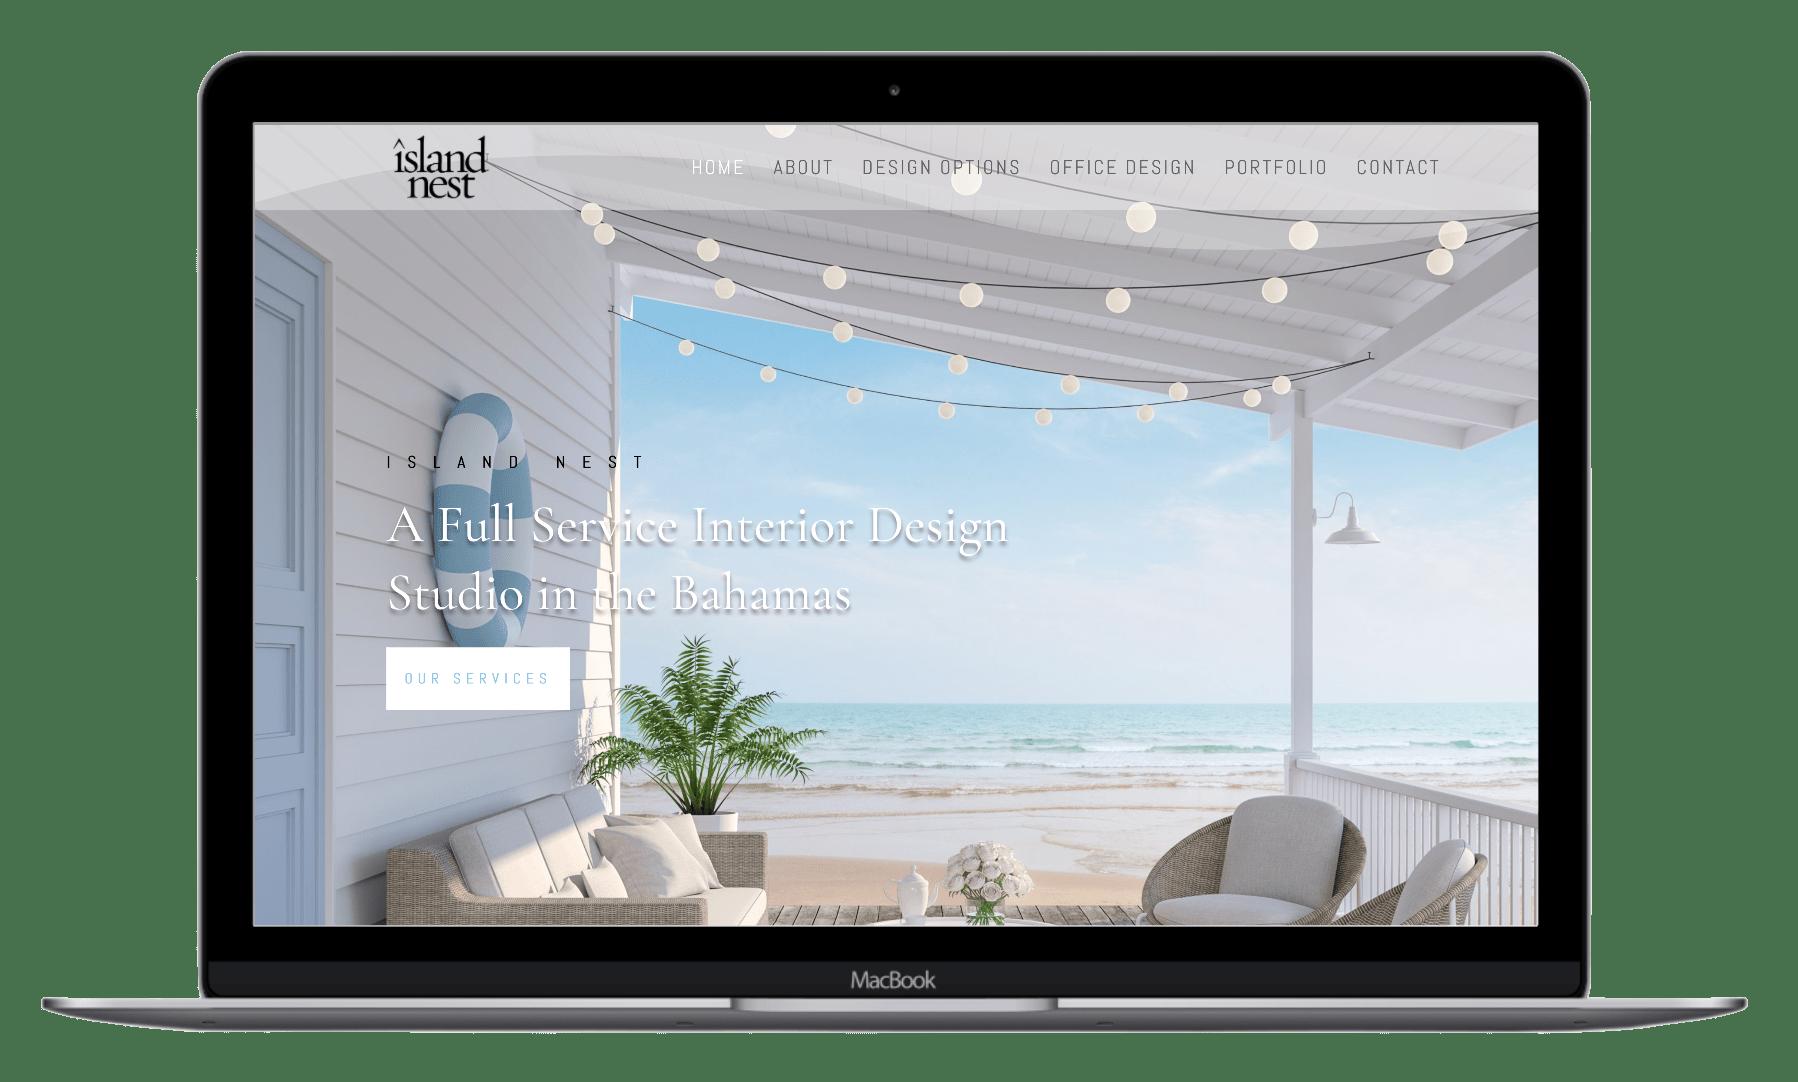 Island nest website design